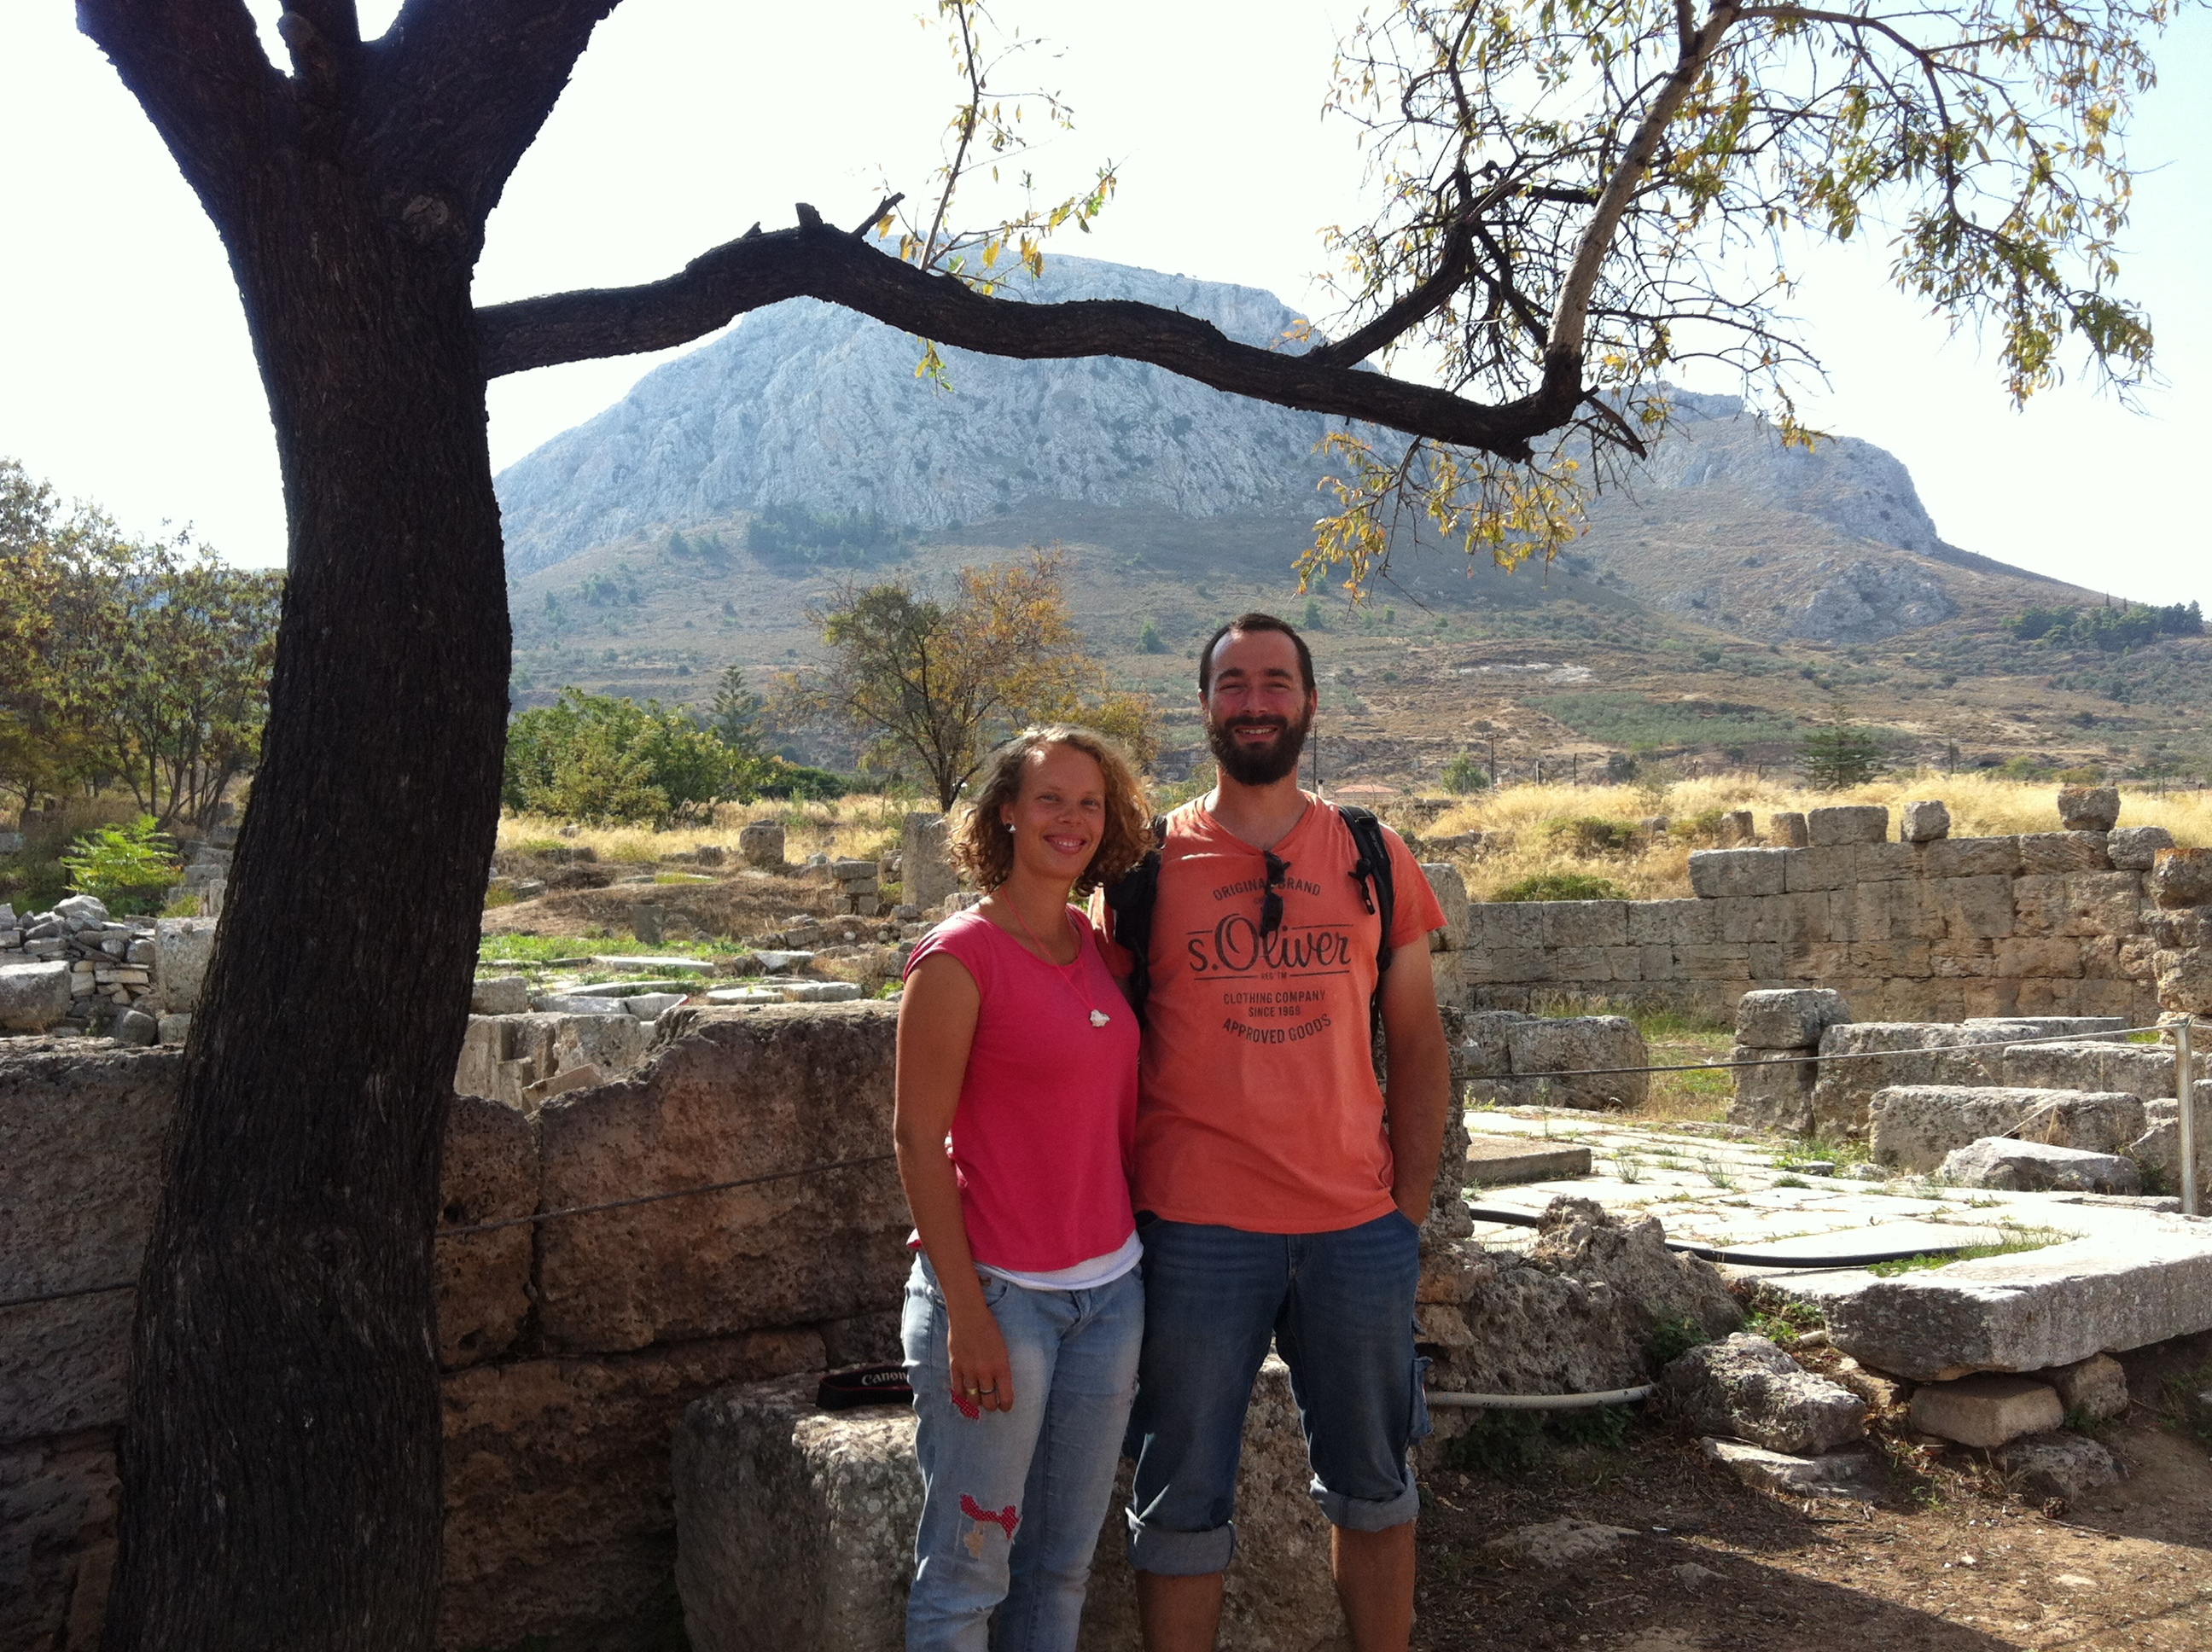 Tom & Ymea Mockel – Crew